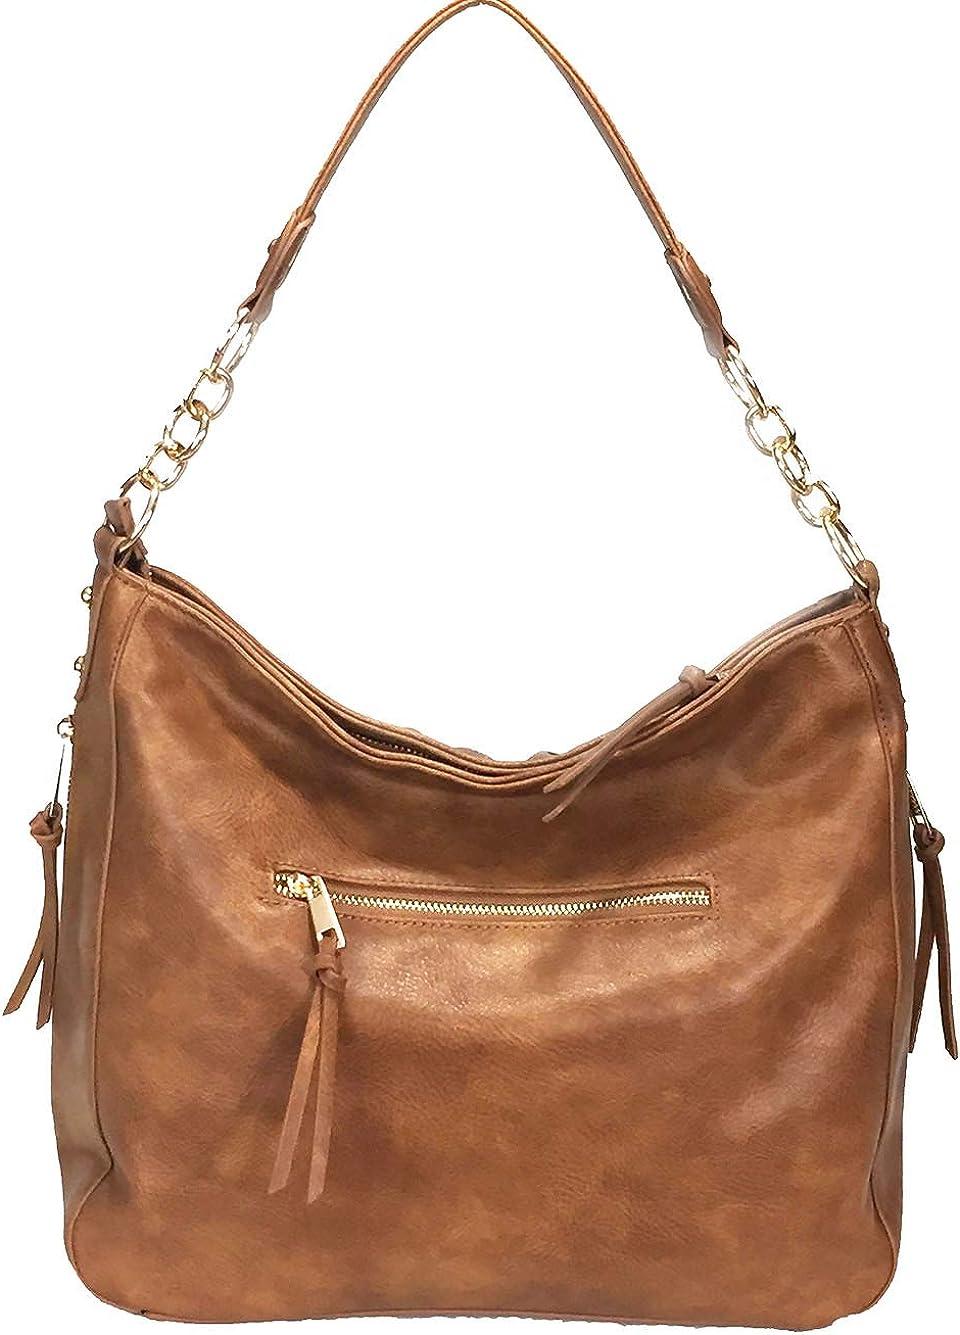 Women Leather Shoulder Bag Soft Double Zipper Inclined Fashionable Handbags Gift